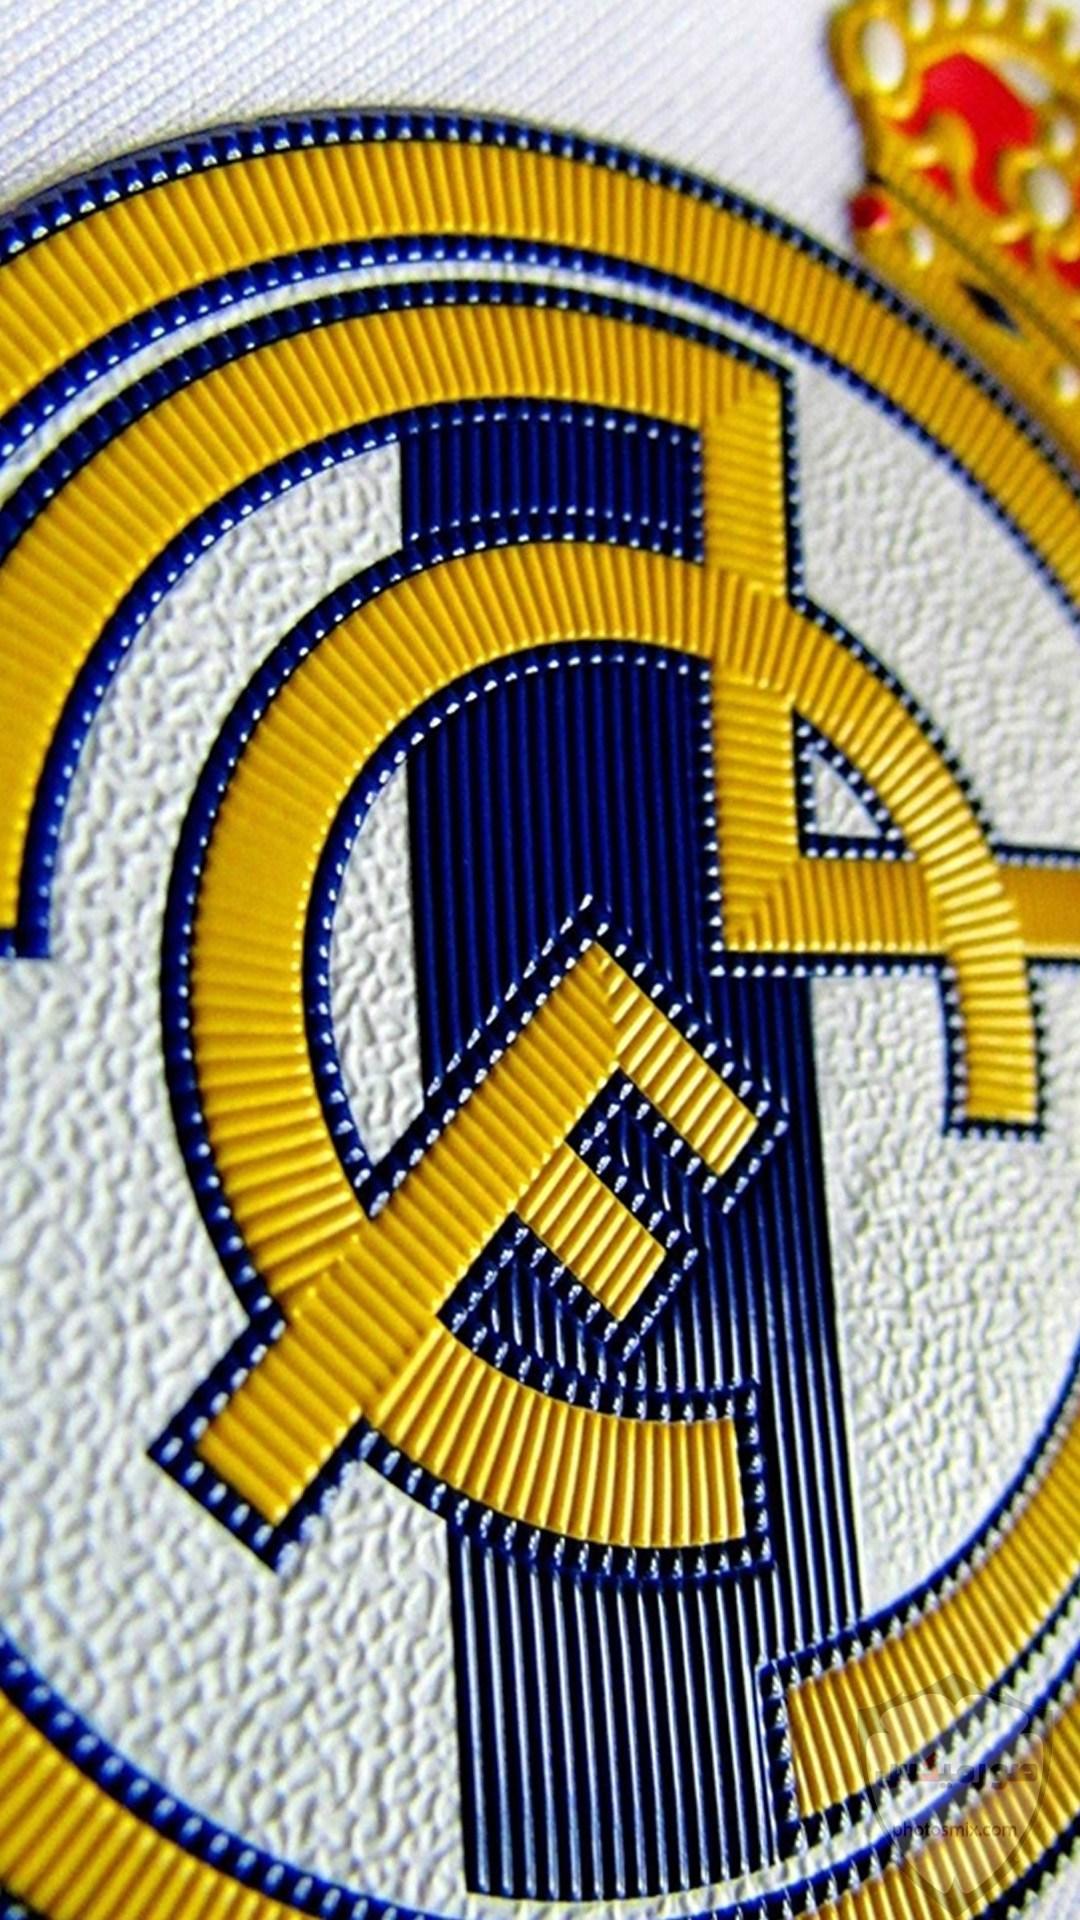 صور ريال مدريد 2020خلفيات ورمزيات ريال مدريد صور لاعبي ريال مدريد real madrid 14